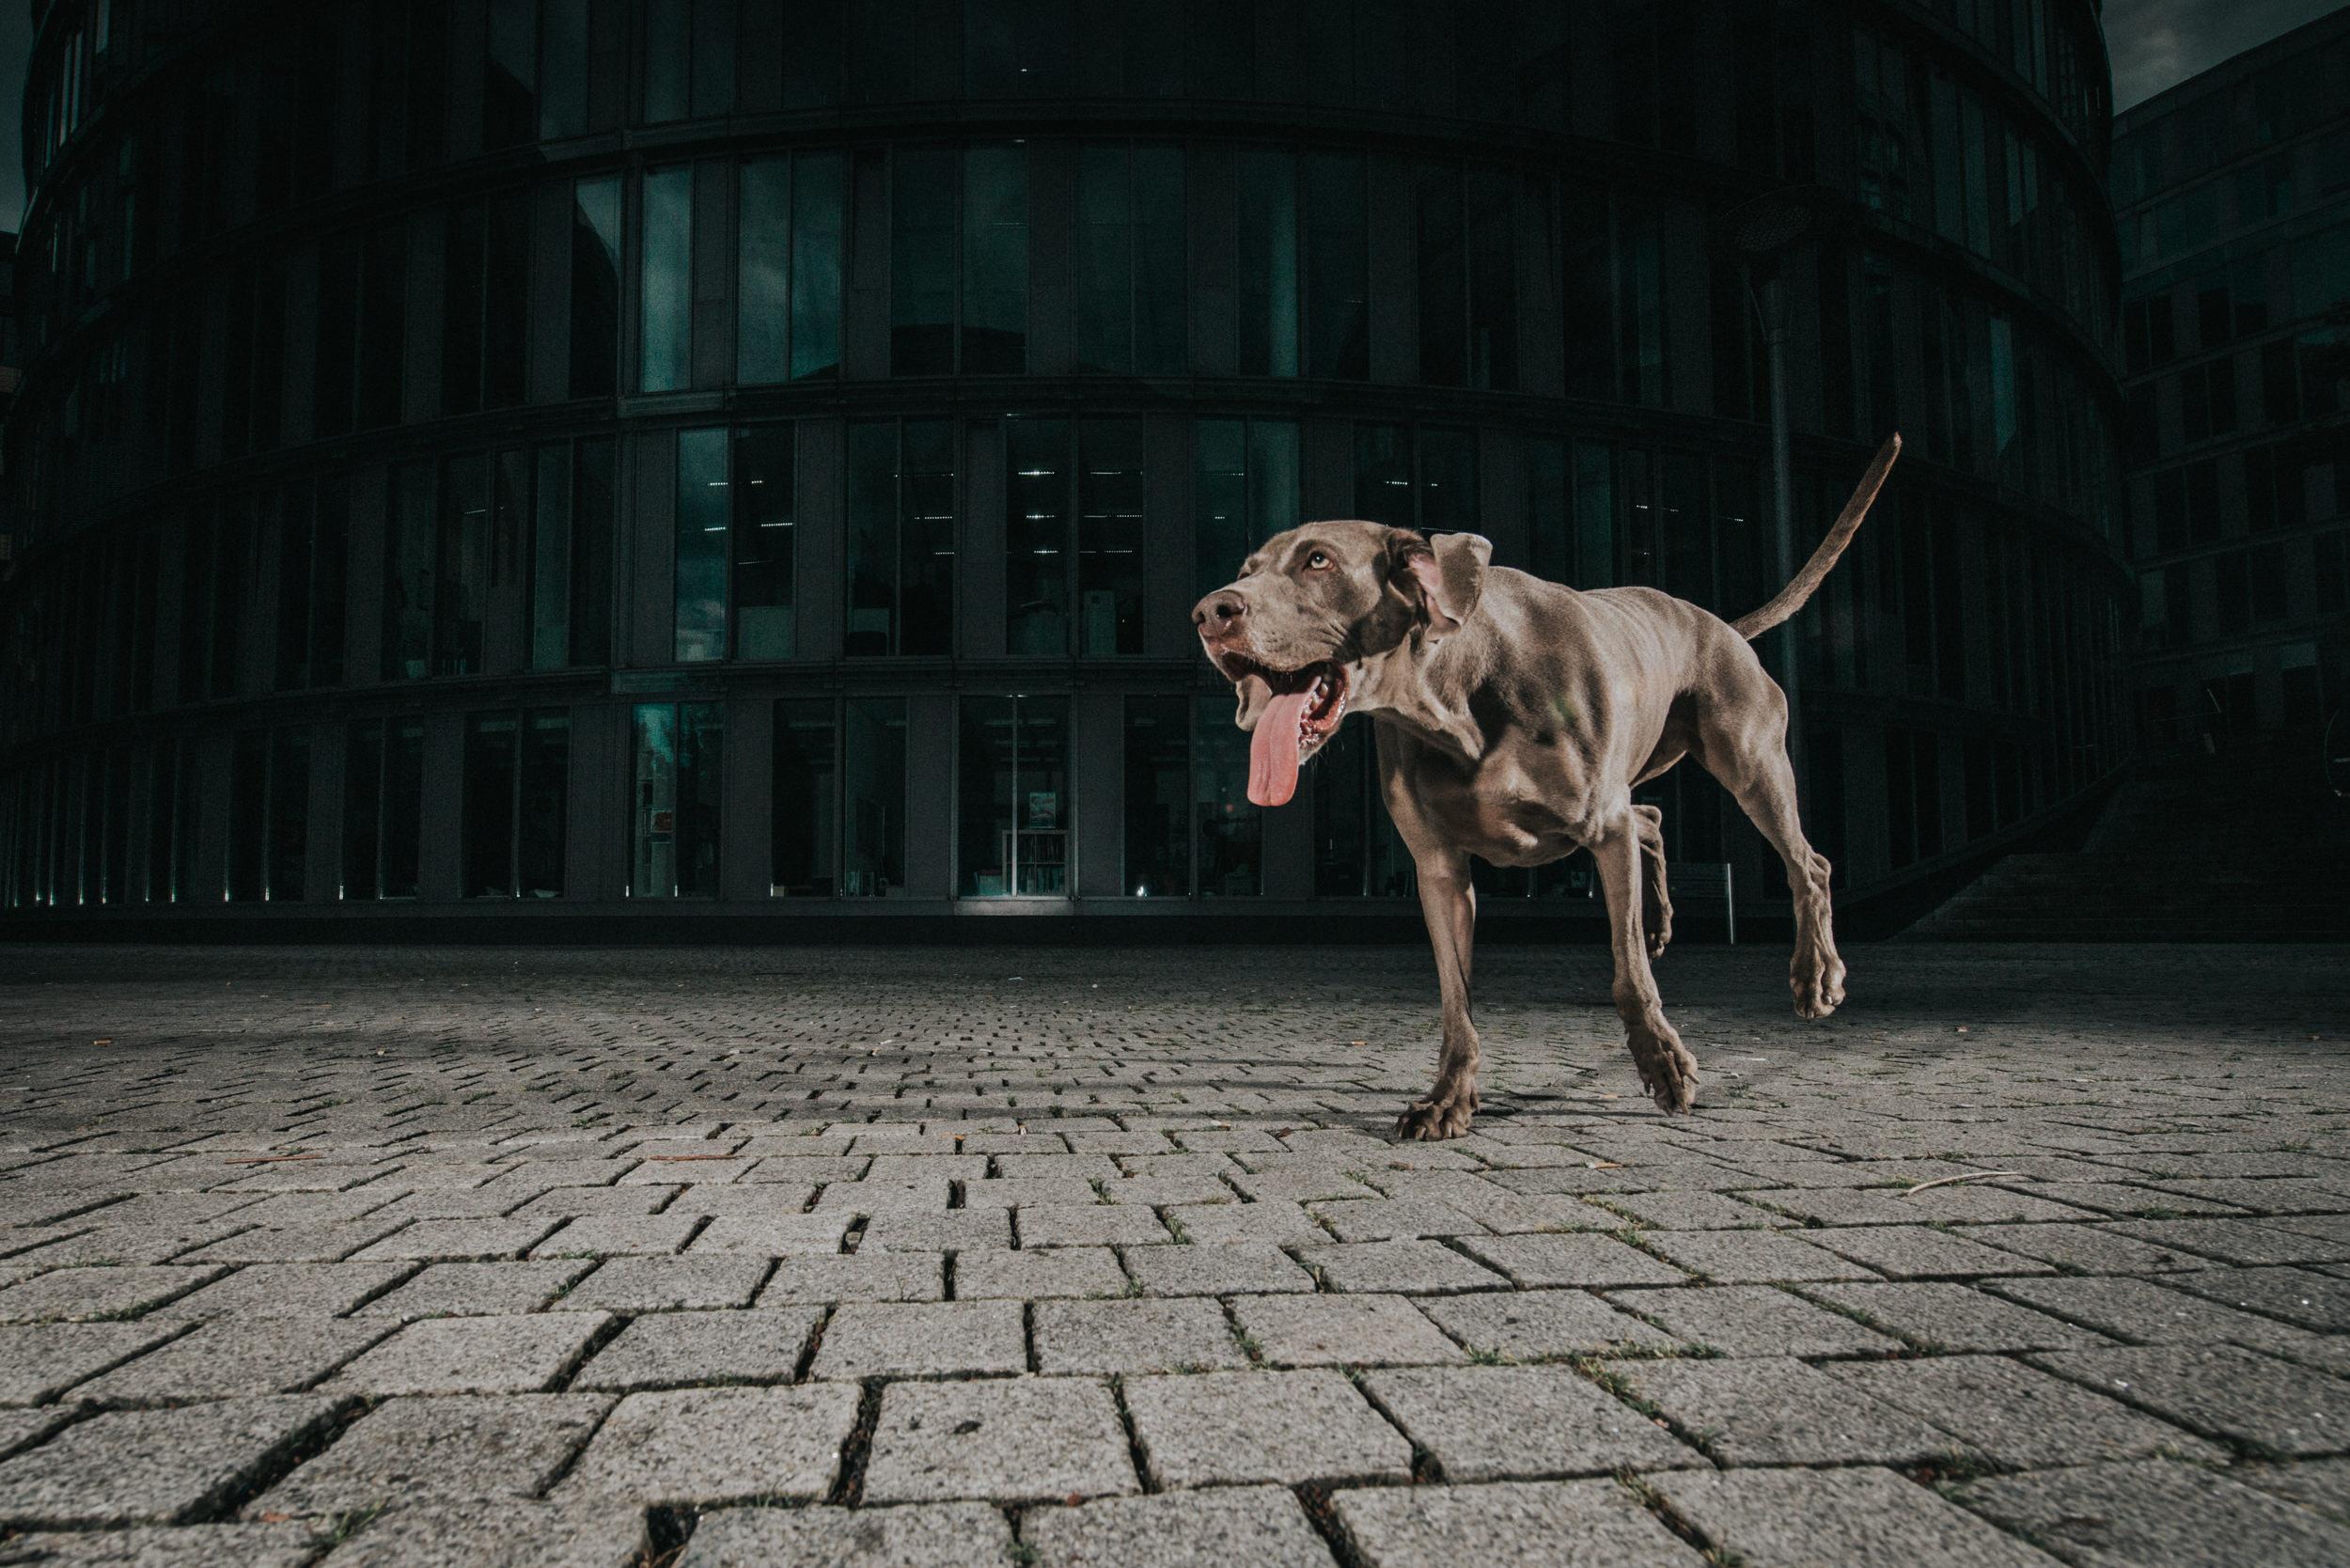 outdoor-dogs-klausdyba-2.jpg